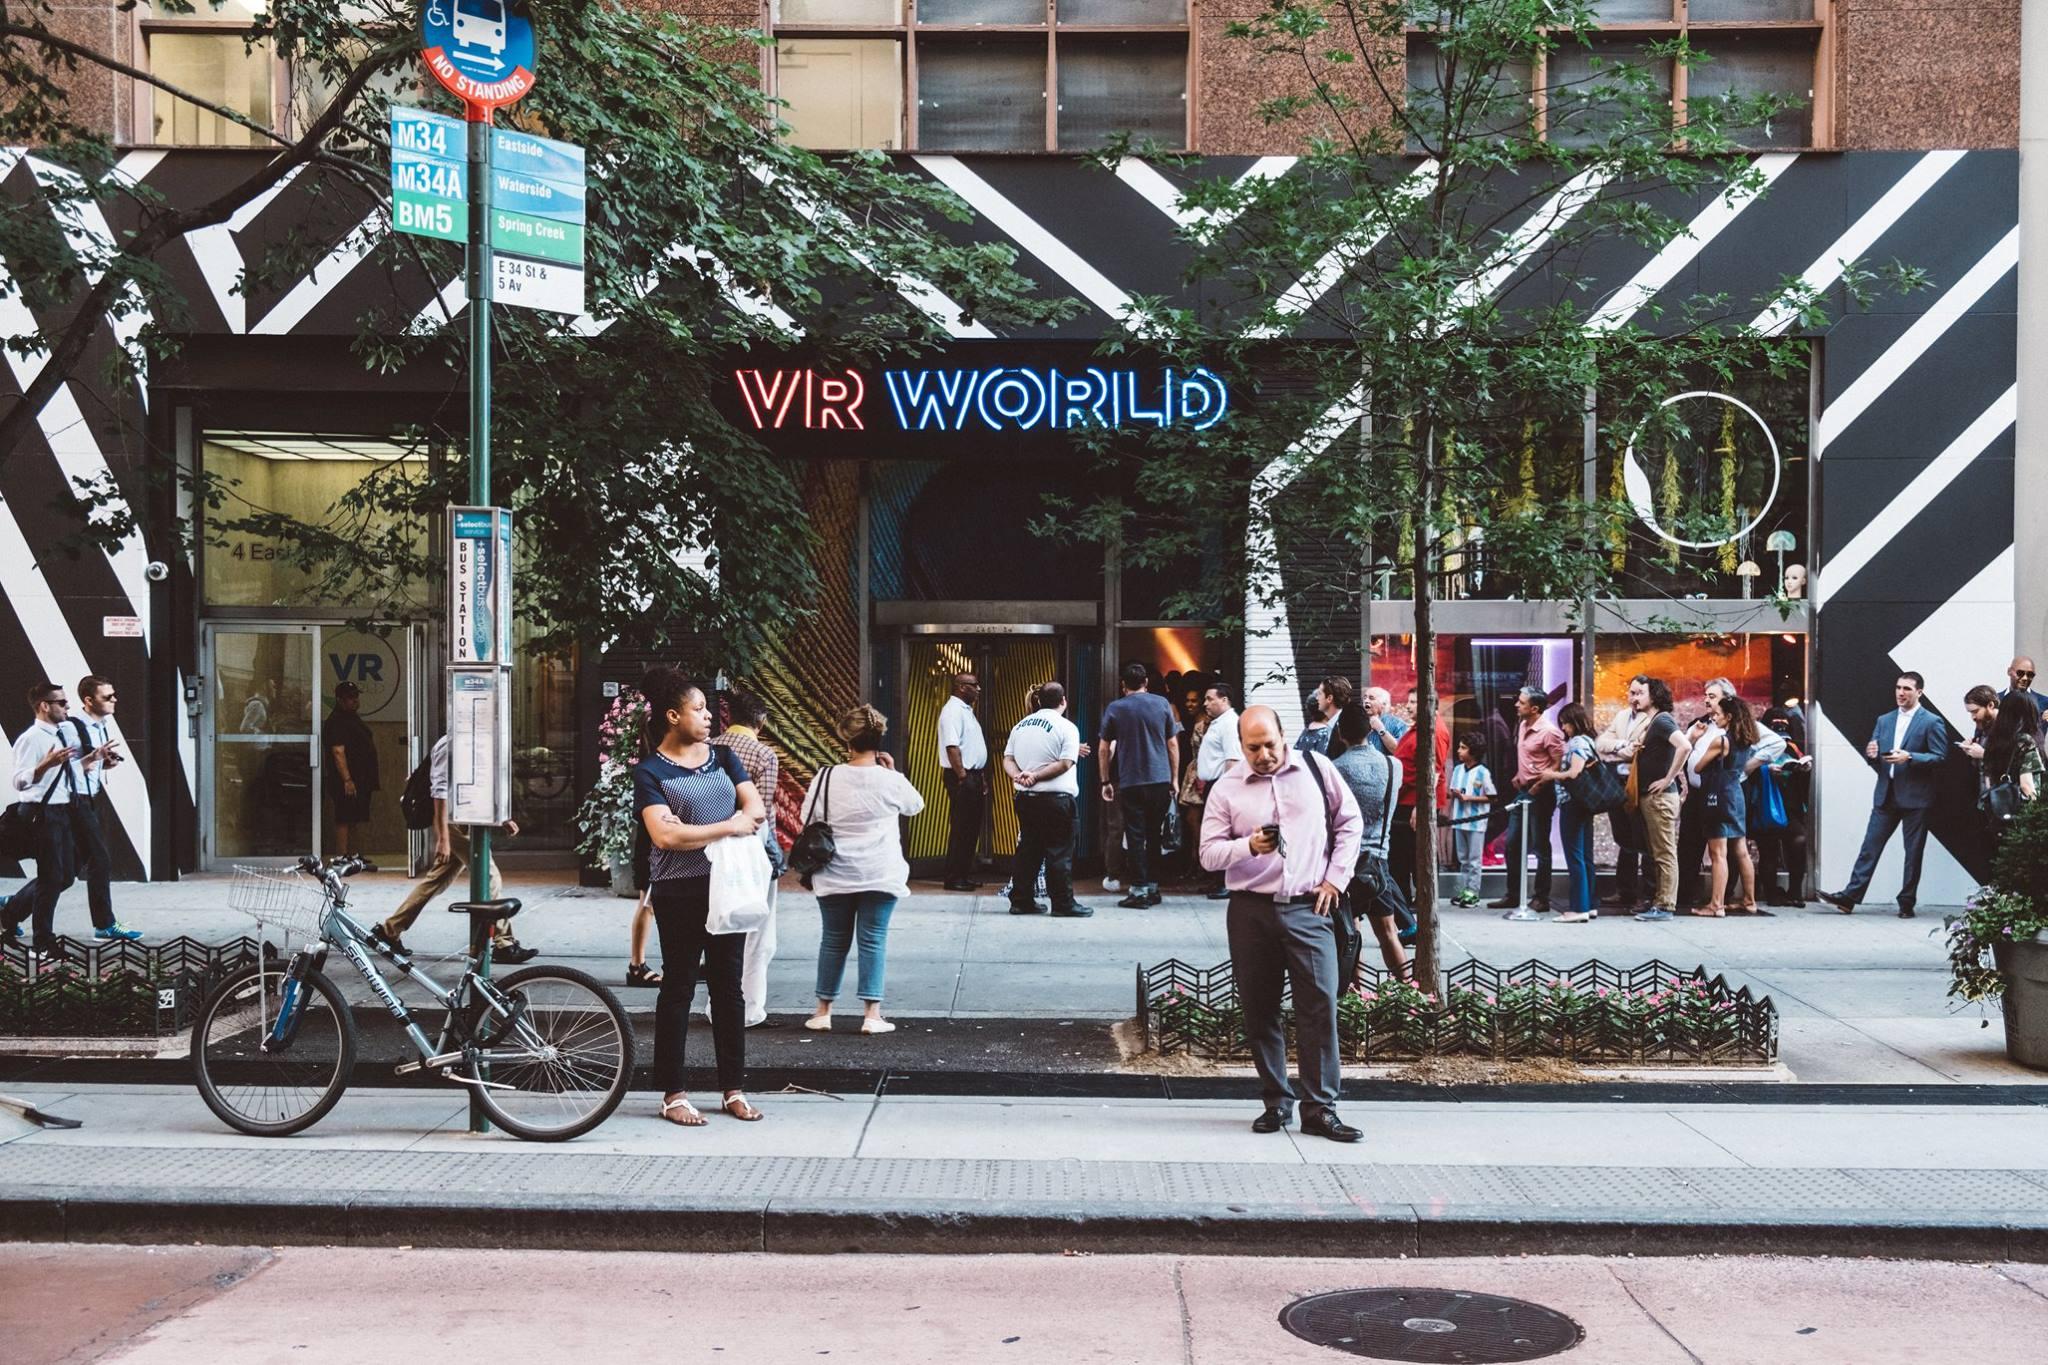 VR World in Manhattan on their launch day June 21st, 2017.